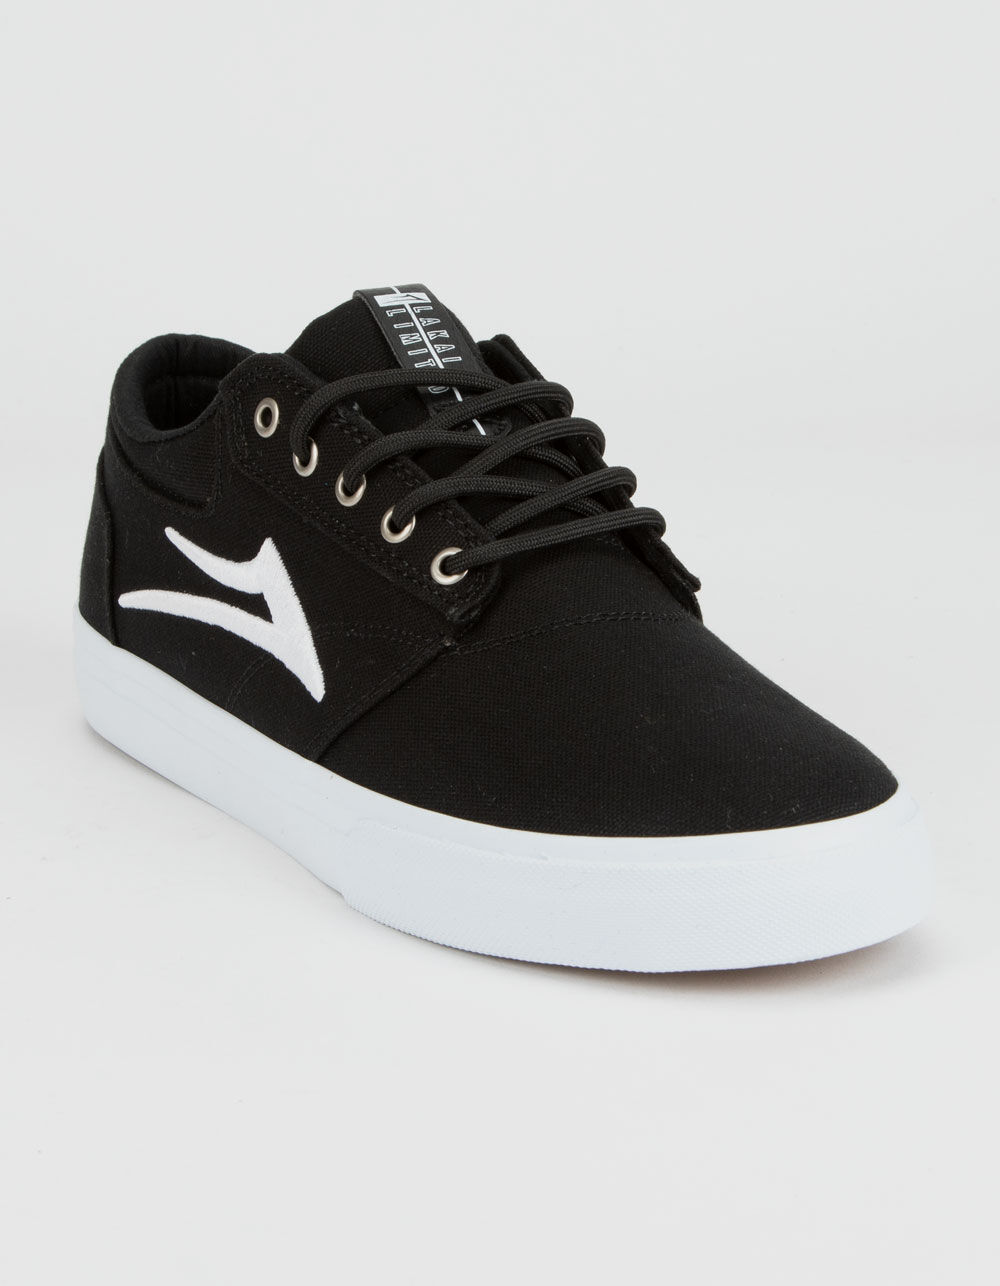 LAKAI Griffin Black & White Canvas Shoes